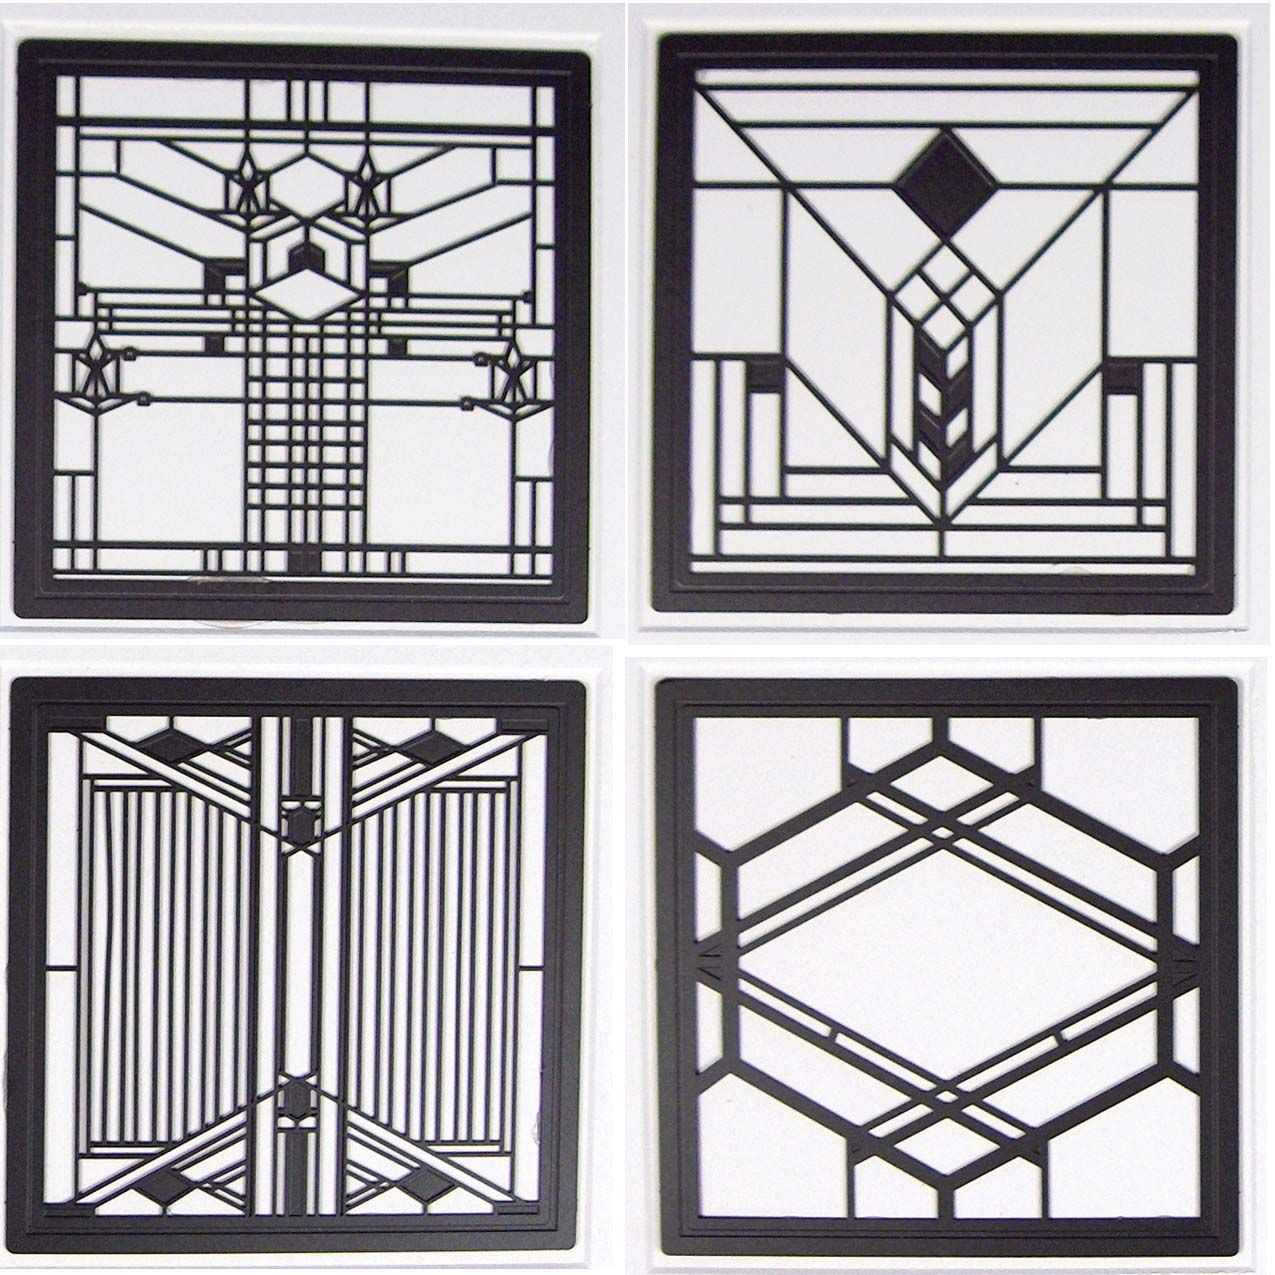 hindostone products coasterstone fwas600 frank lloyd wright art glass ii metal insert absorbent. Black Bedroom Furniture Sets. Home Design Ideas